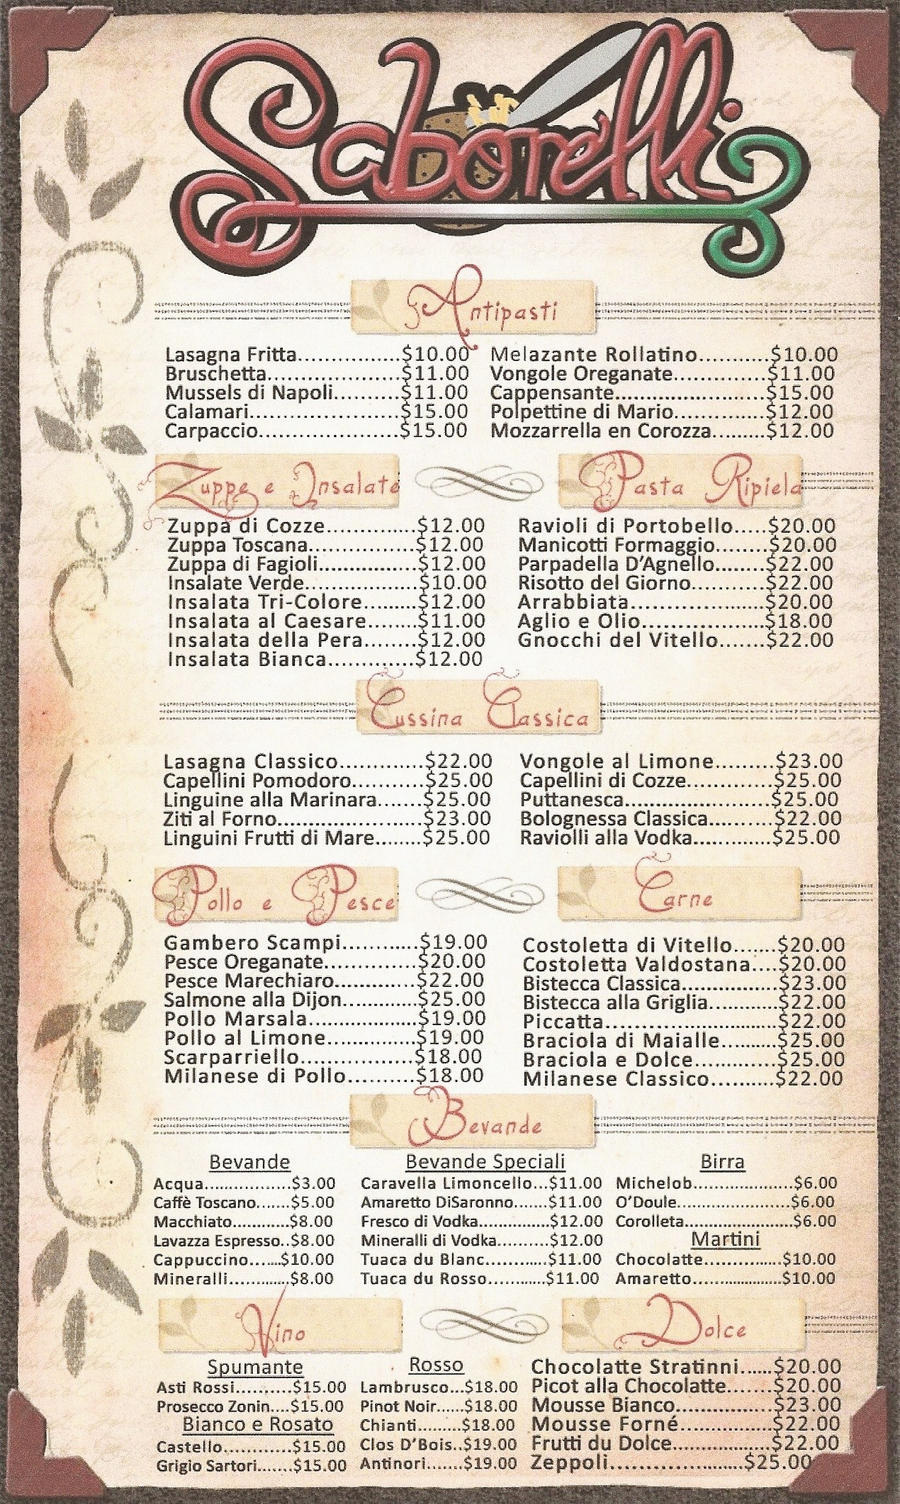 saborelli menu template p by countess pap on deviantart